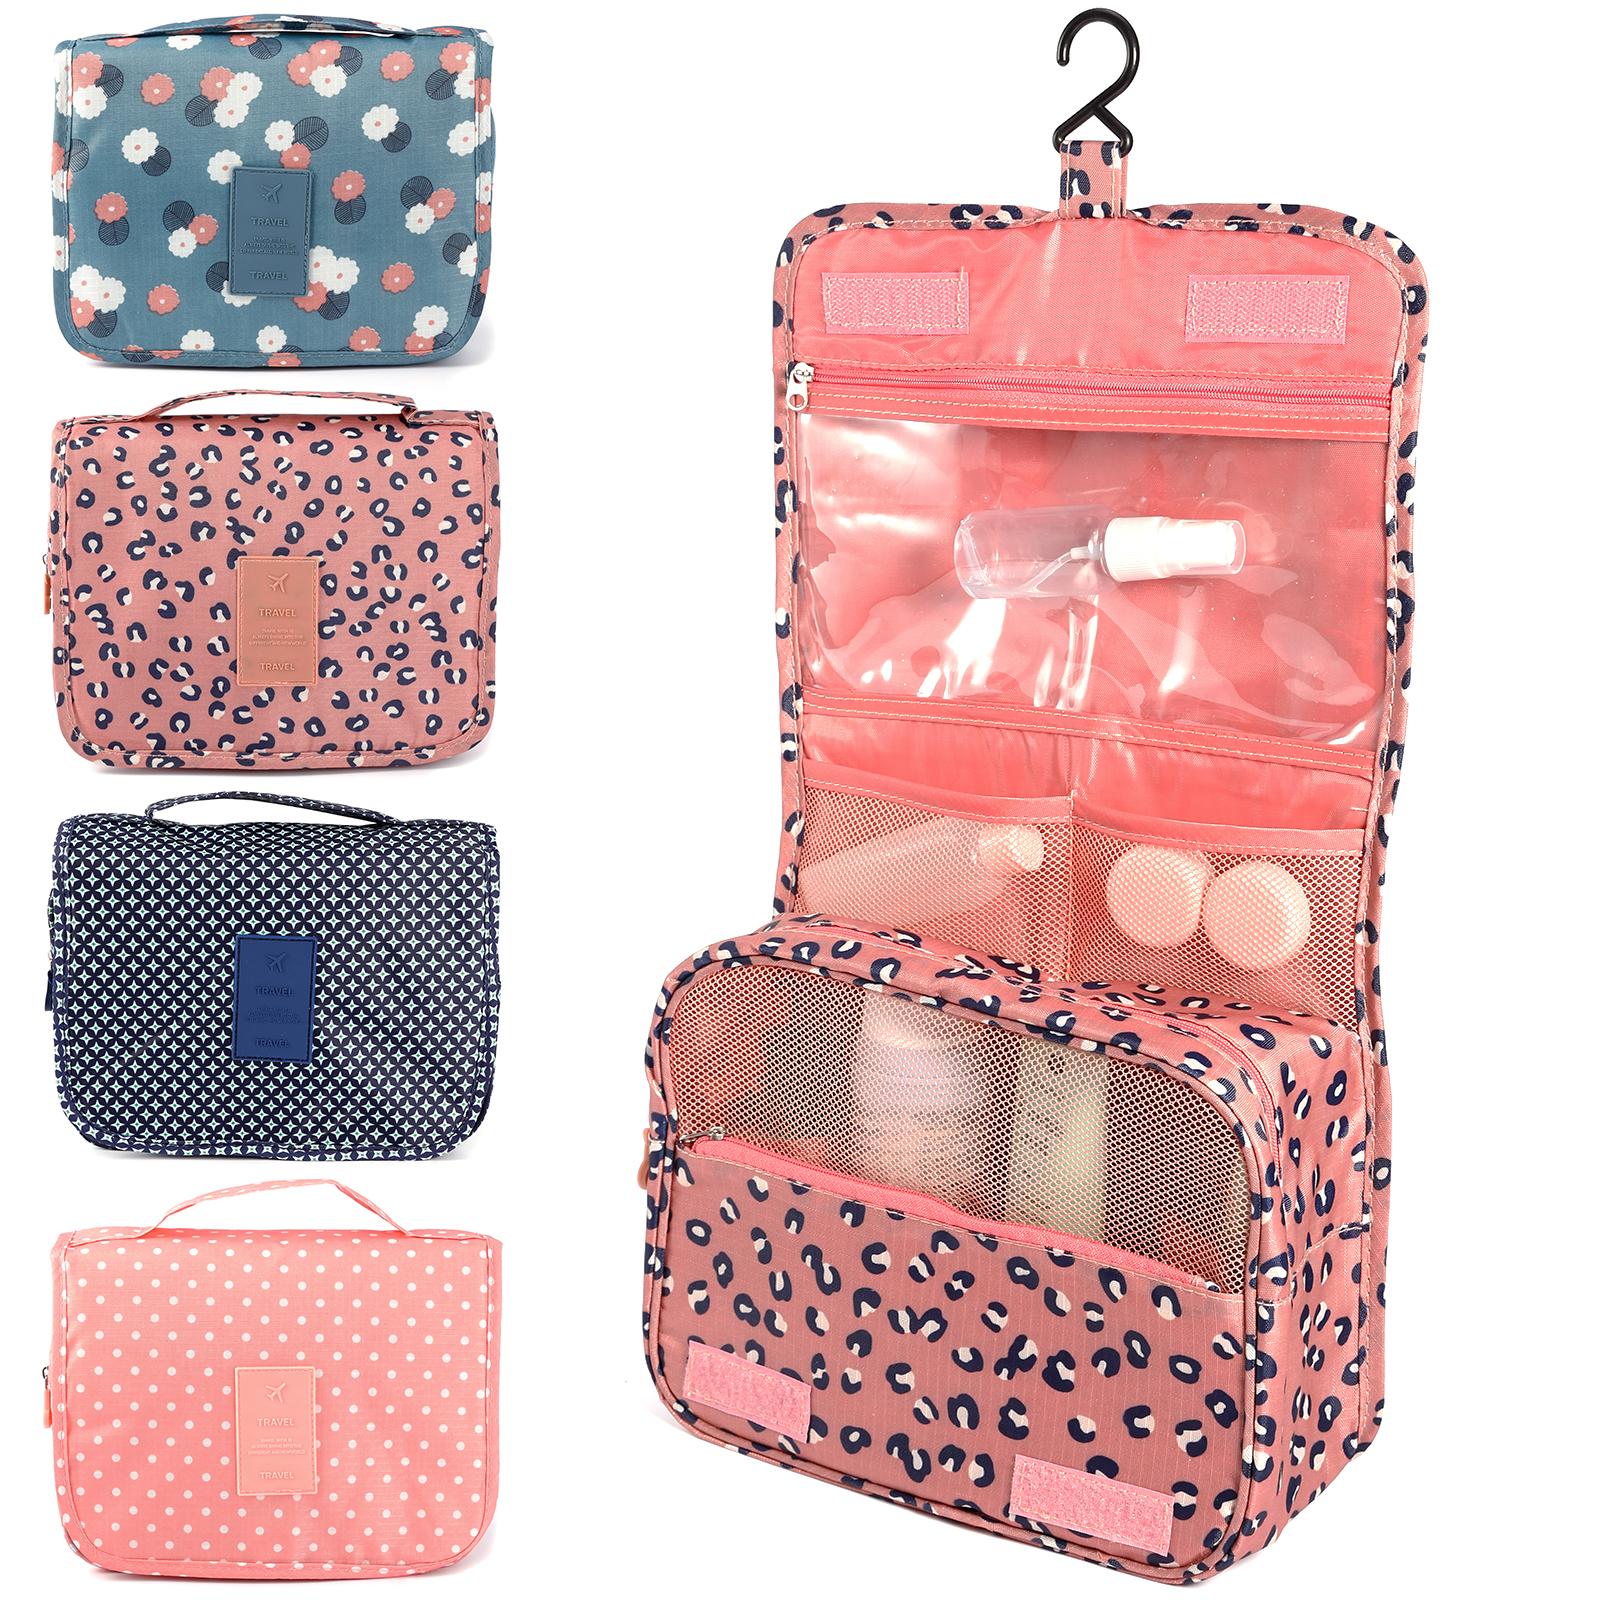 travel cosmetic makeup bag wash bag organizer pouch. Black Bedroom Furniture Sets. Home Design Ideas